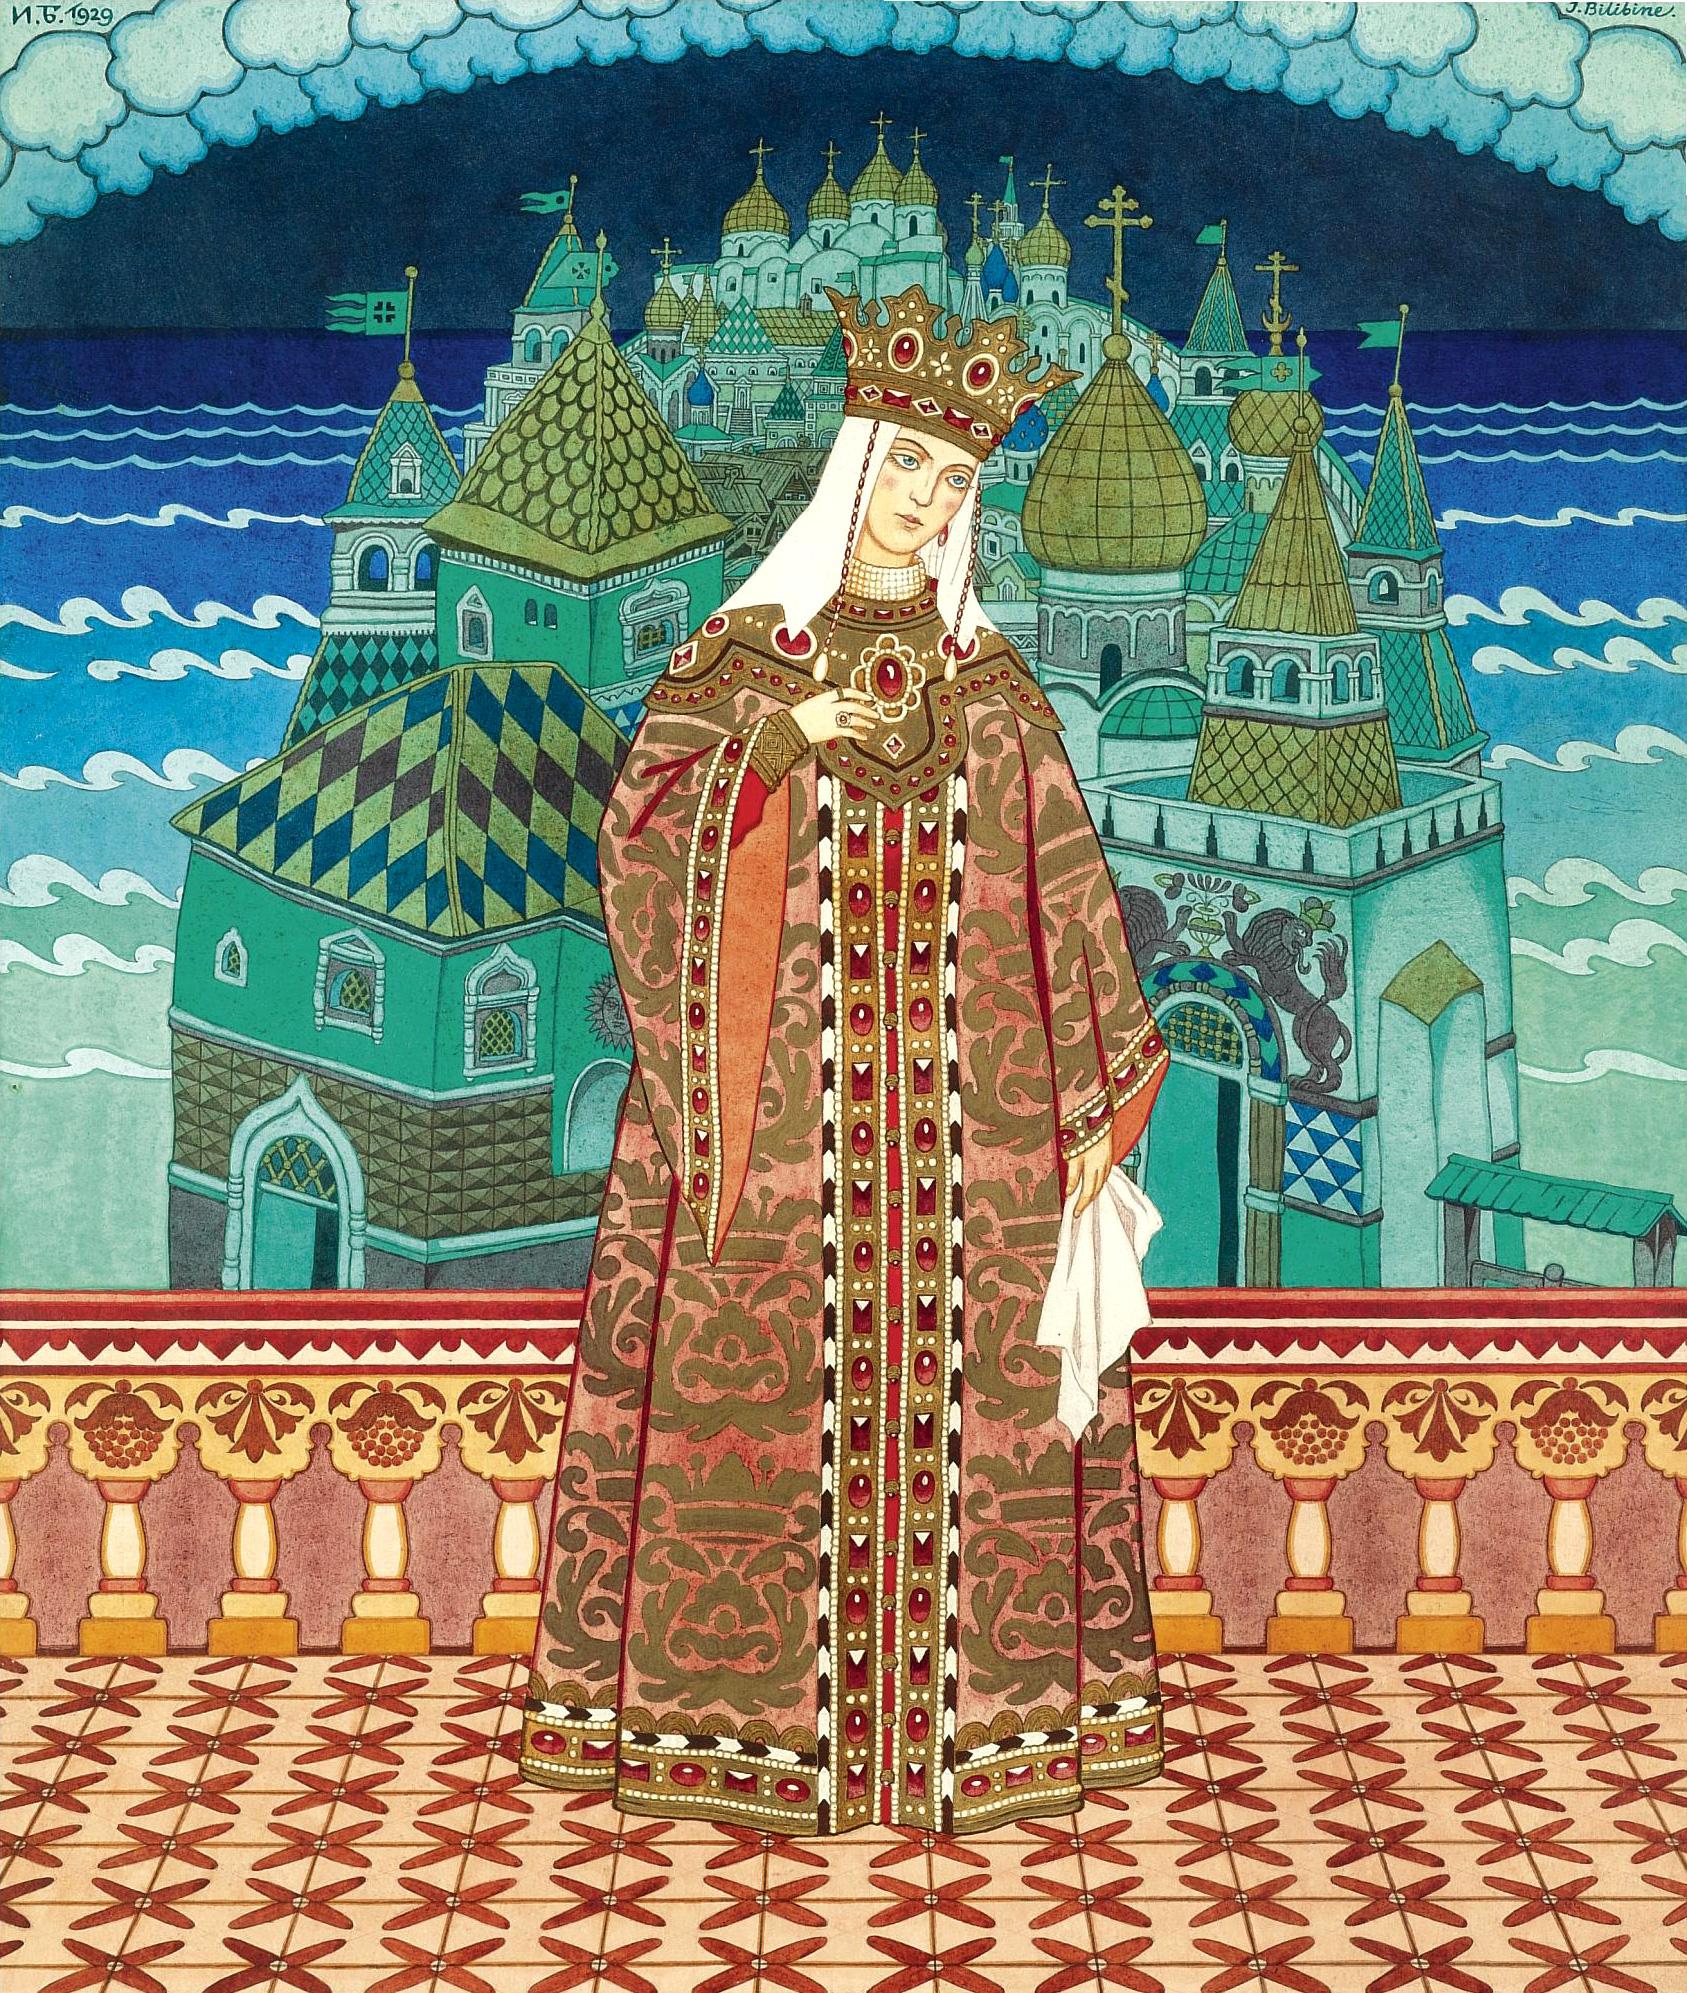 Ivan Bilibin - Tsaritsa Militritsa